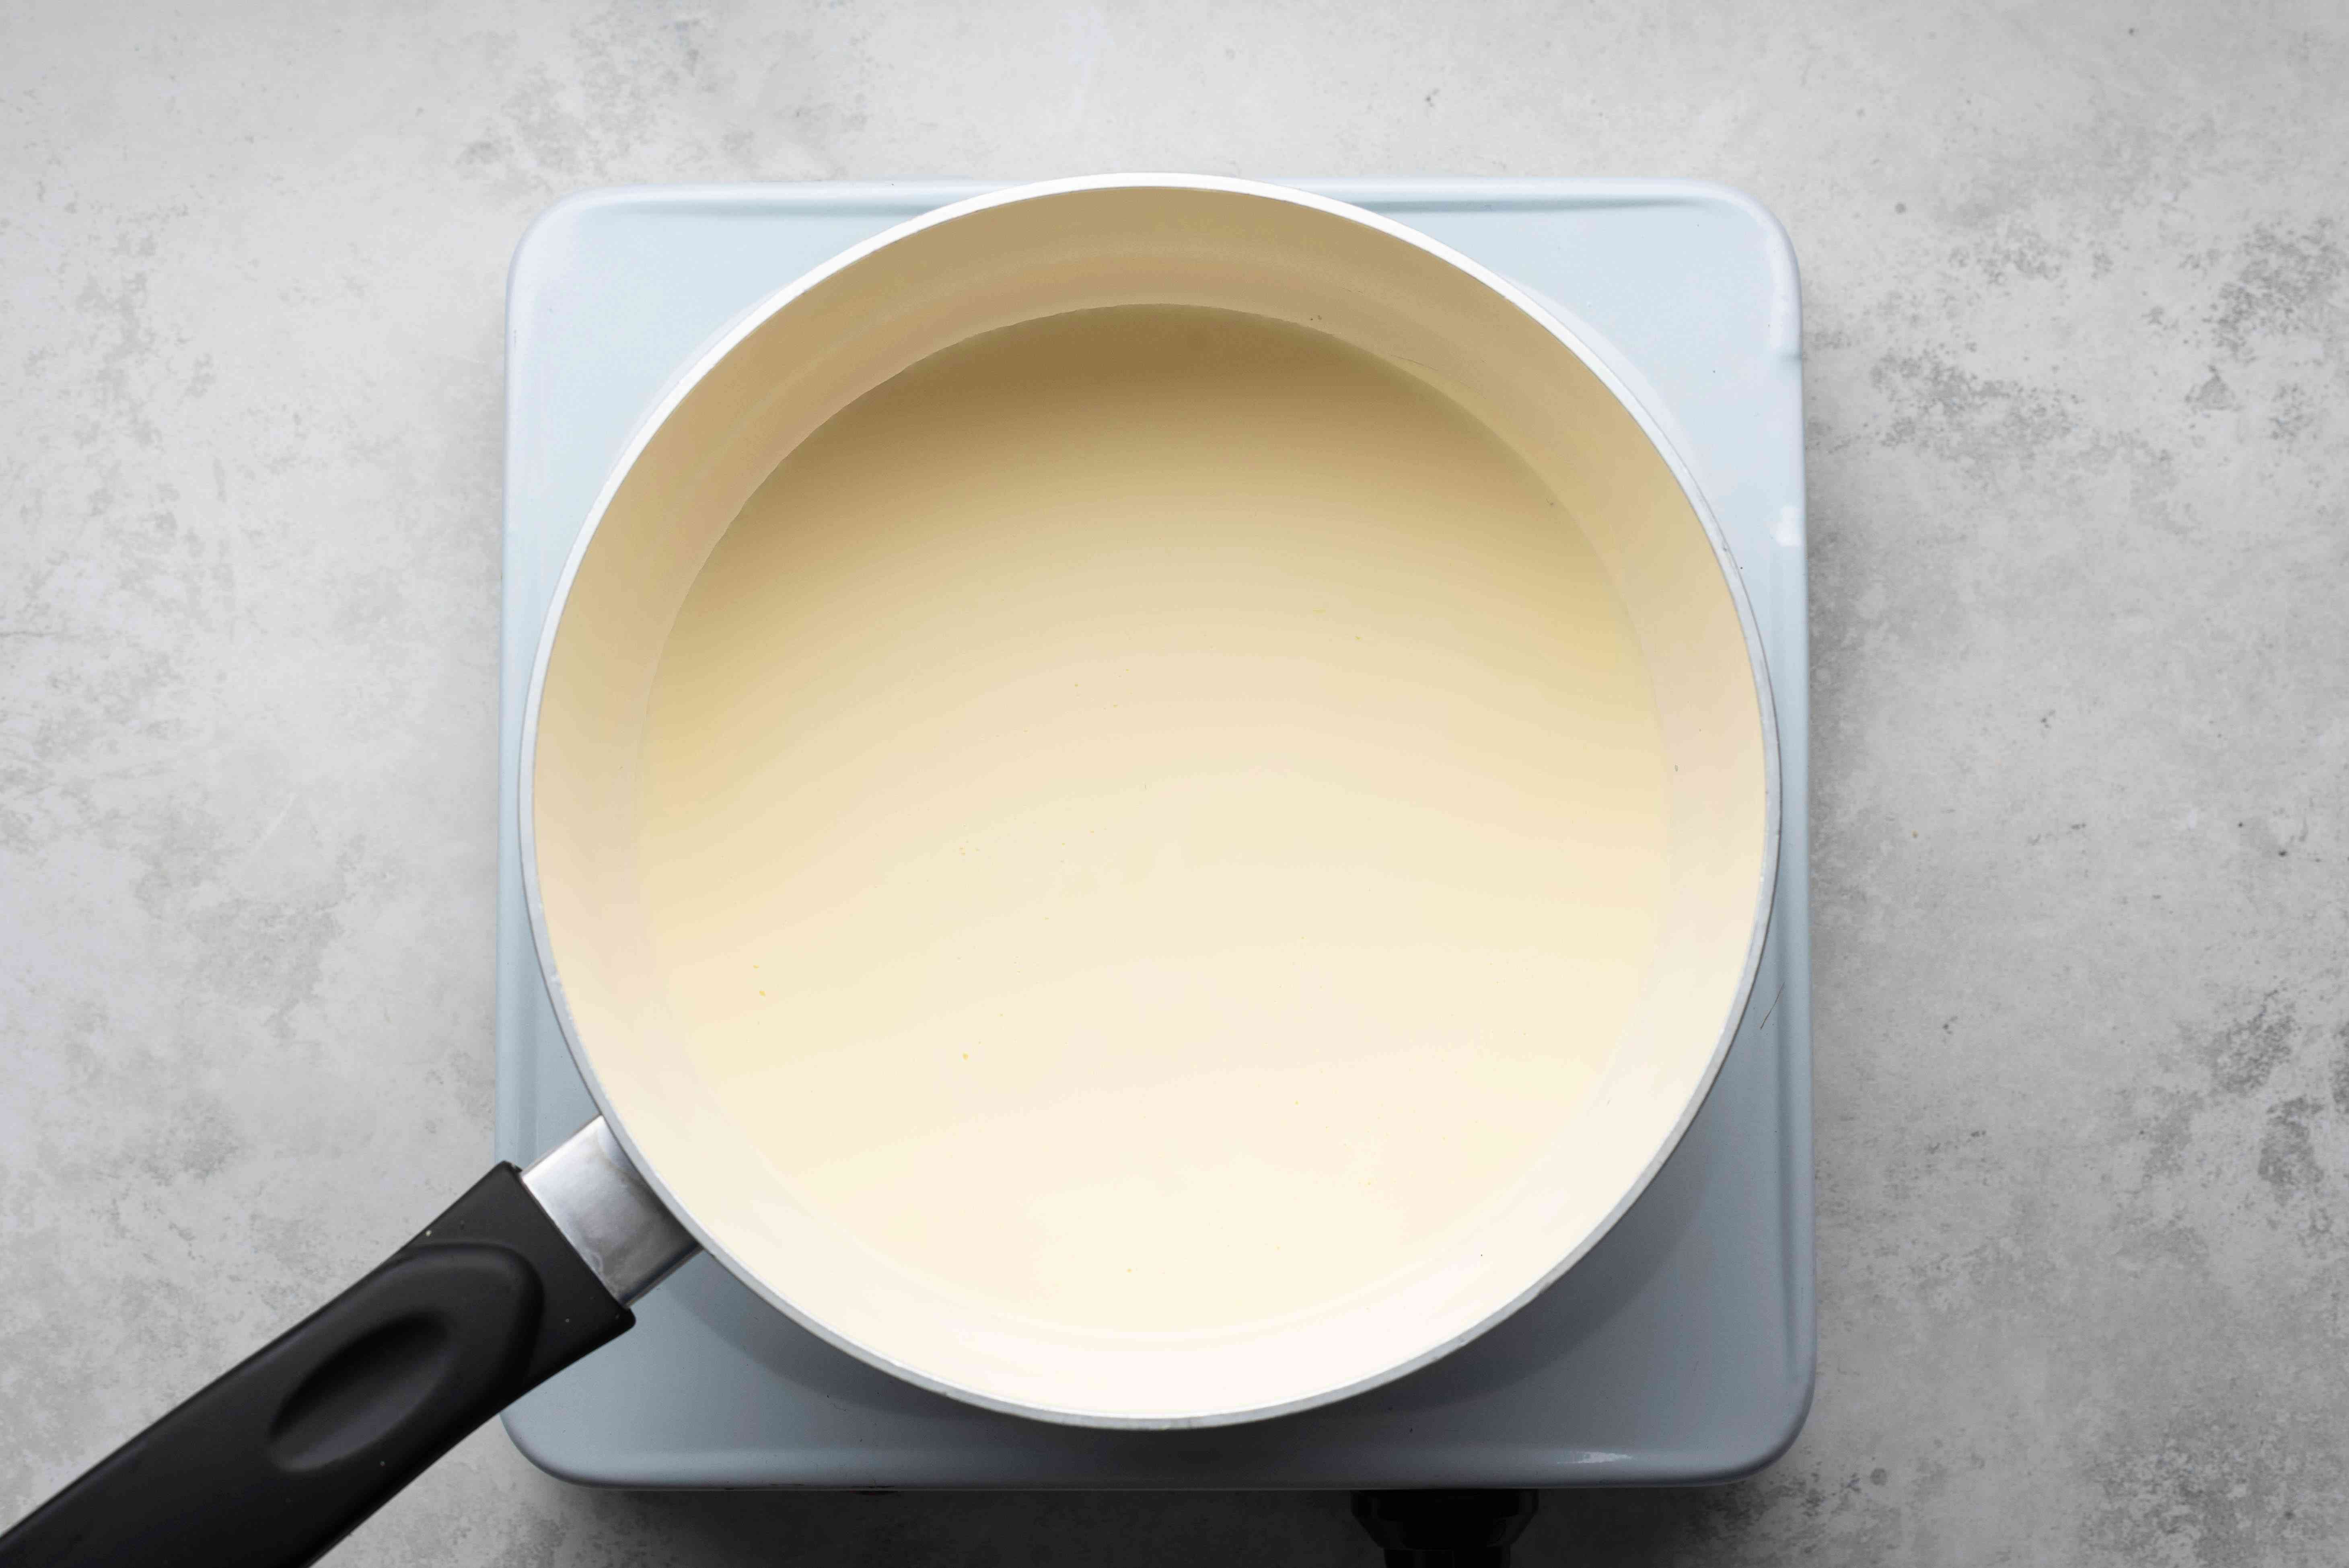 cream in a saucepan